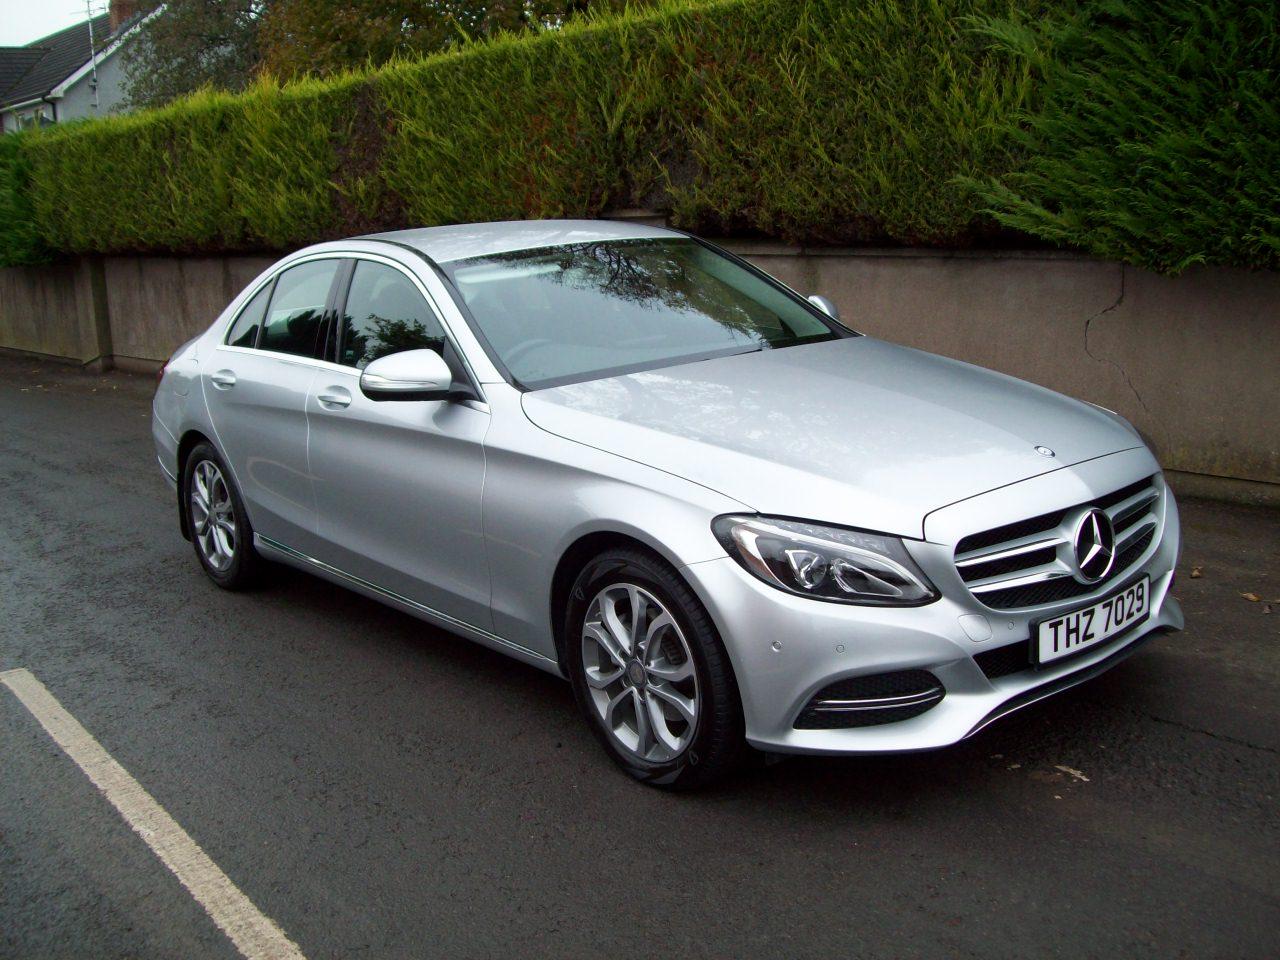 2014 Mercedes-Benz C Class Diesel Tiptronic Automatic – Derek Loane Motors full